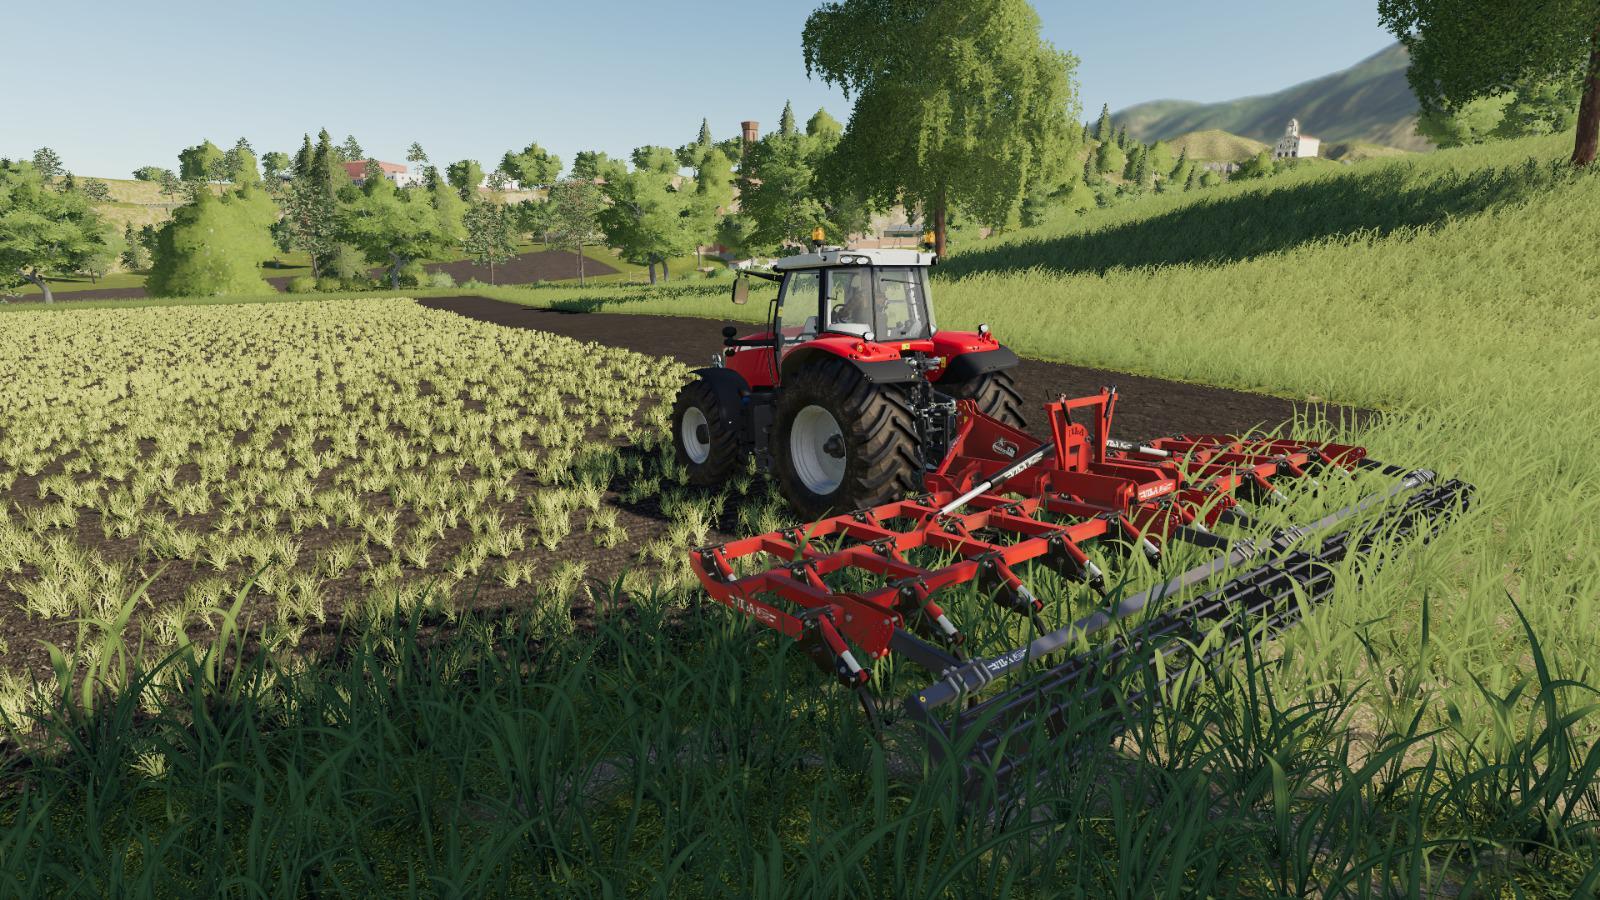 Vila Chisel SXHV 30 v 1 0 | FS19 mods, Farming simulator 19 mods